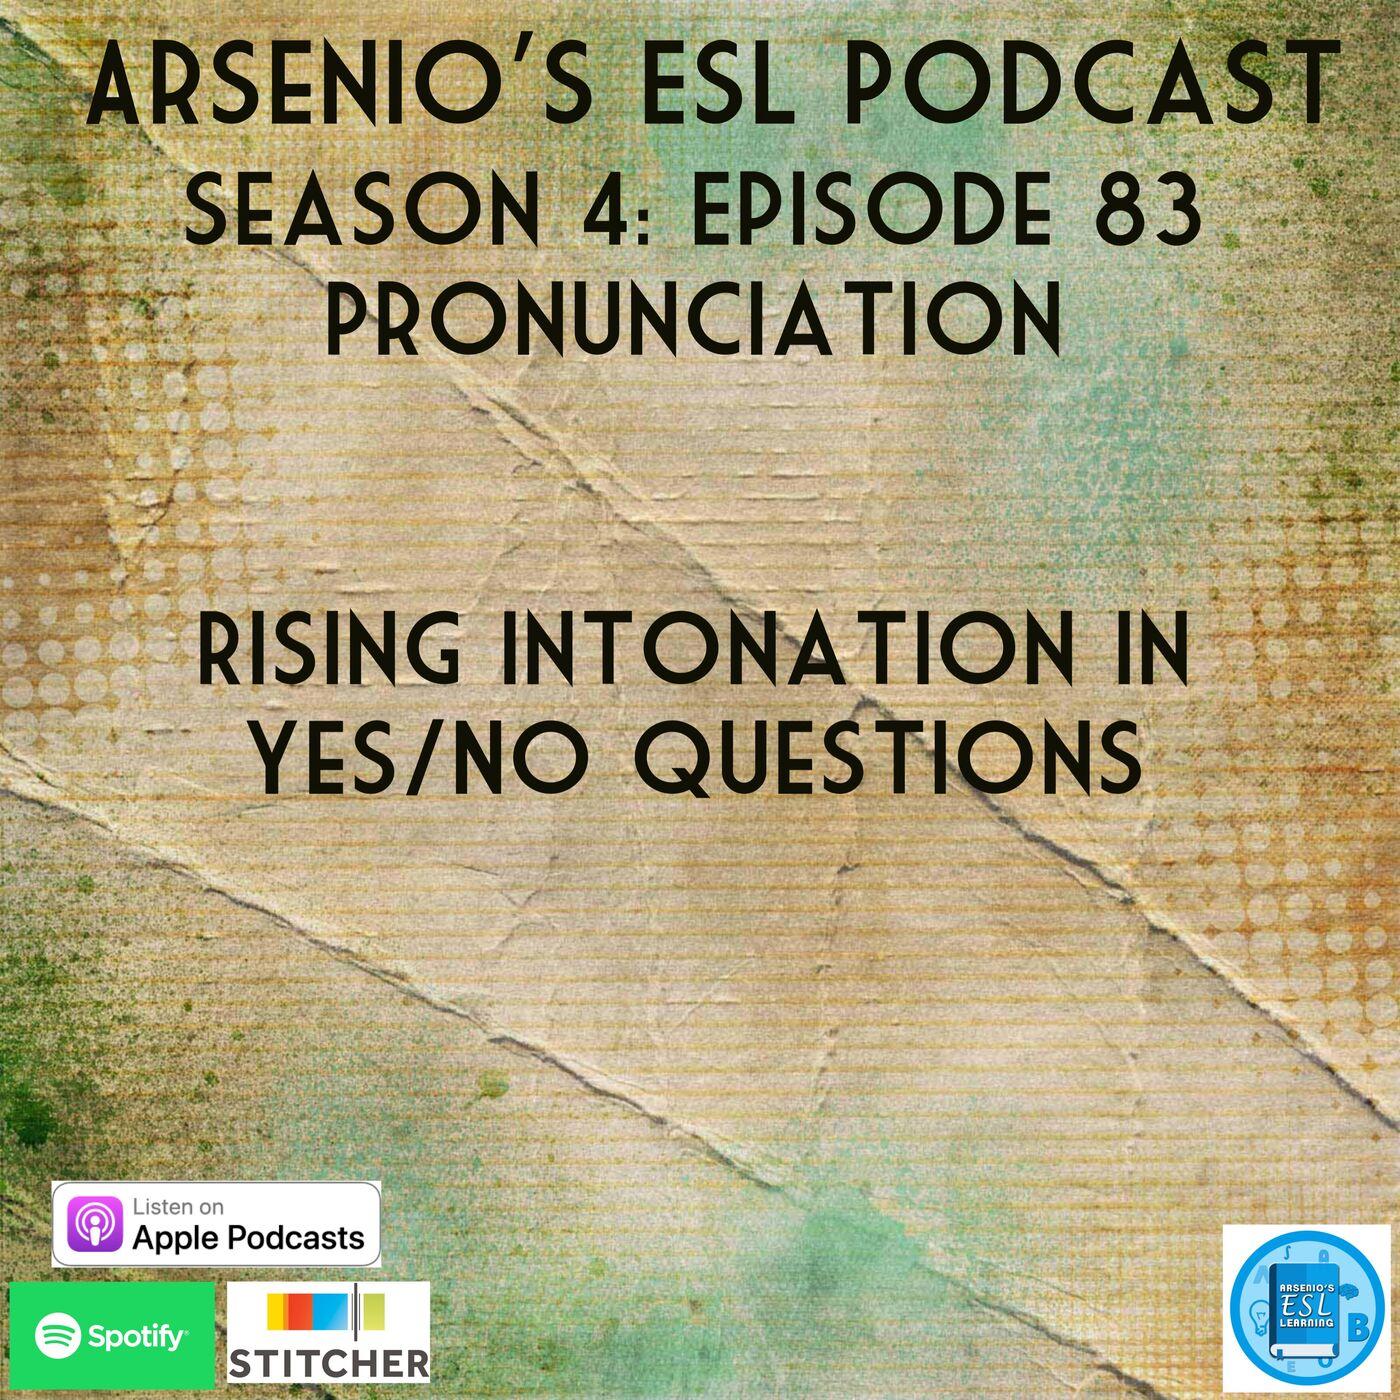 Arsenio's ESL Podcast: Season 4 - Episode 83 - Pronunciation: Rising Intonation in Yes/No Questions